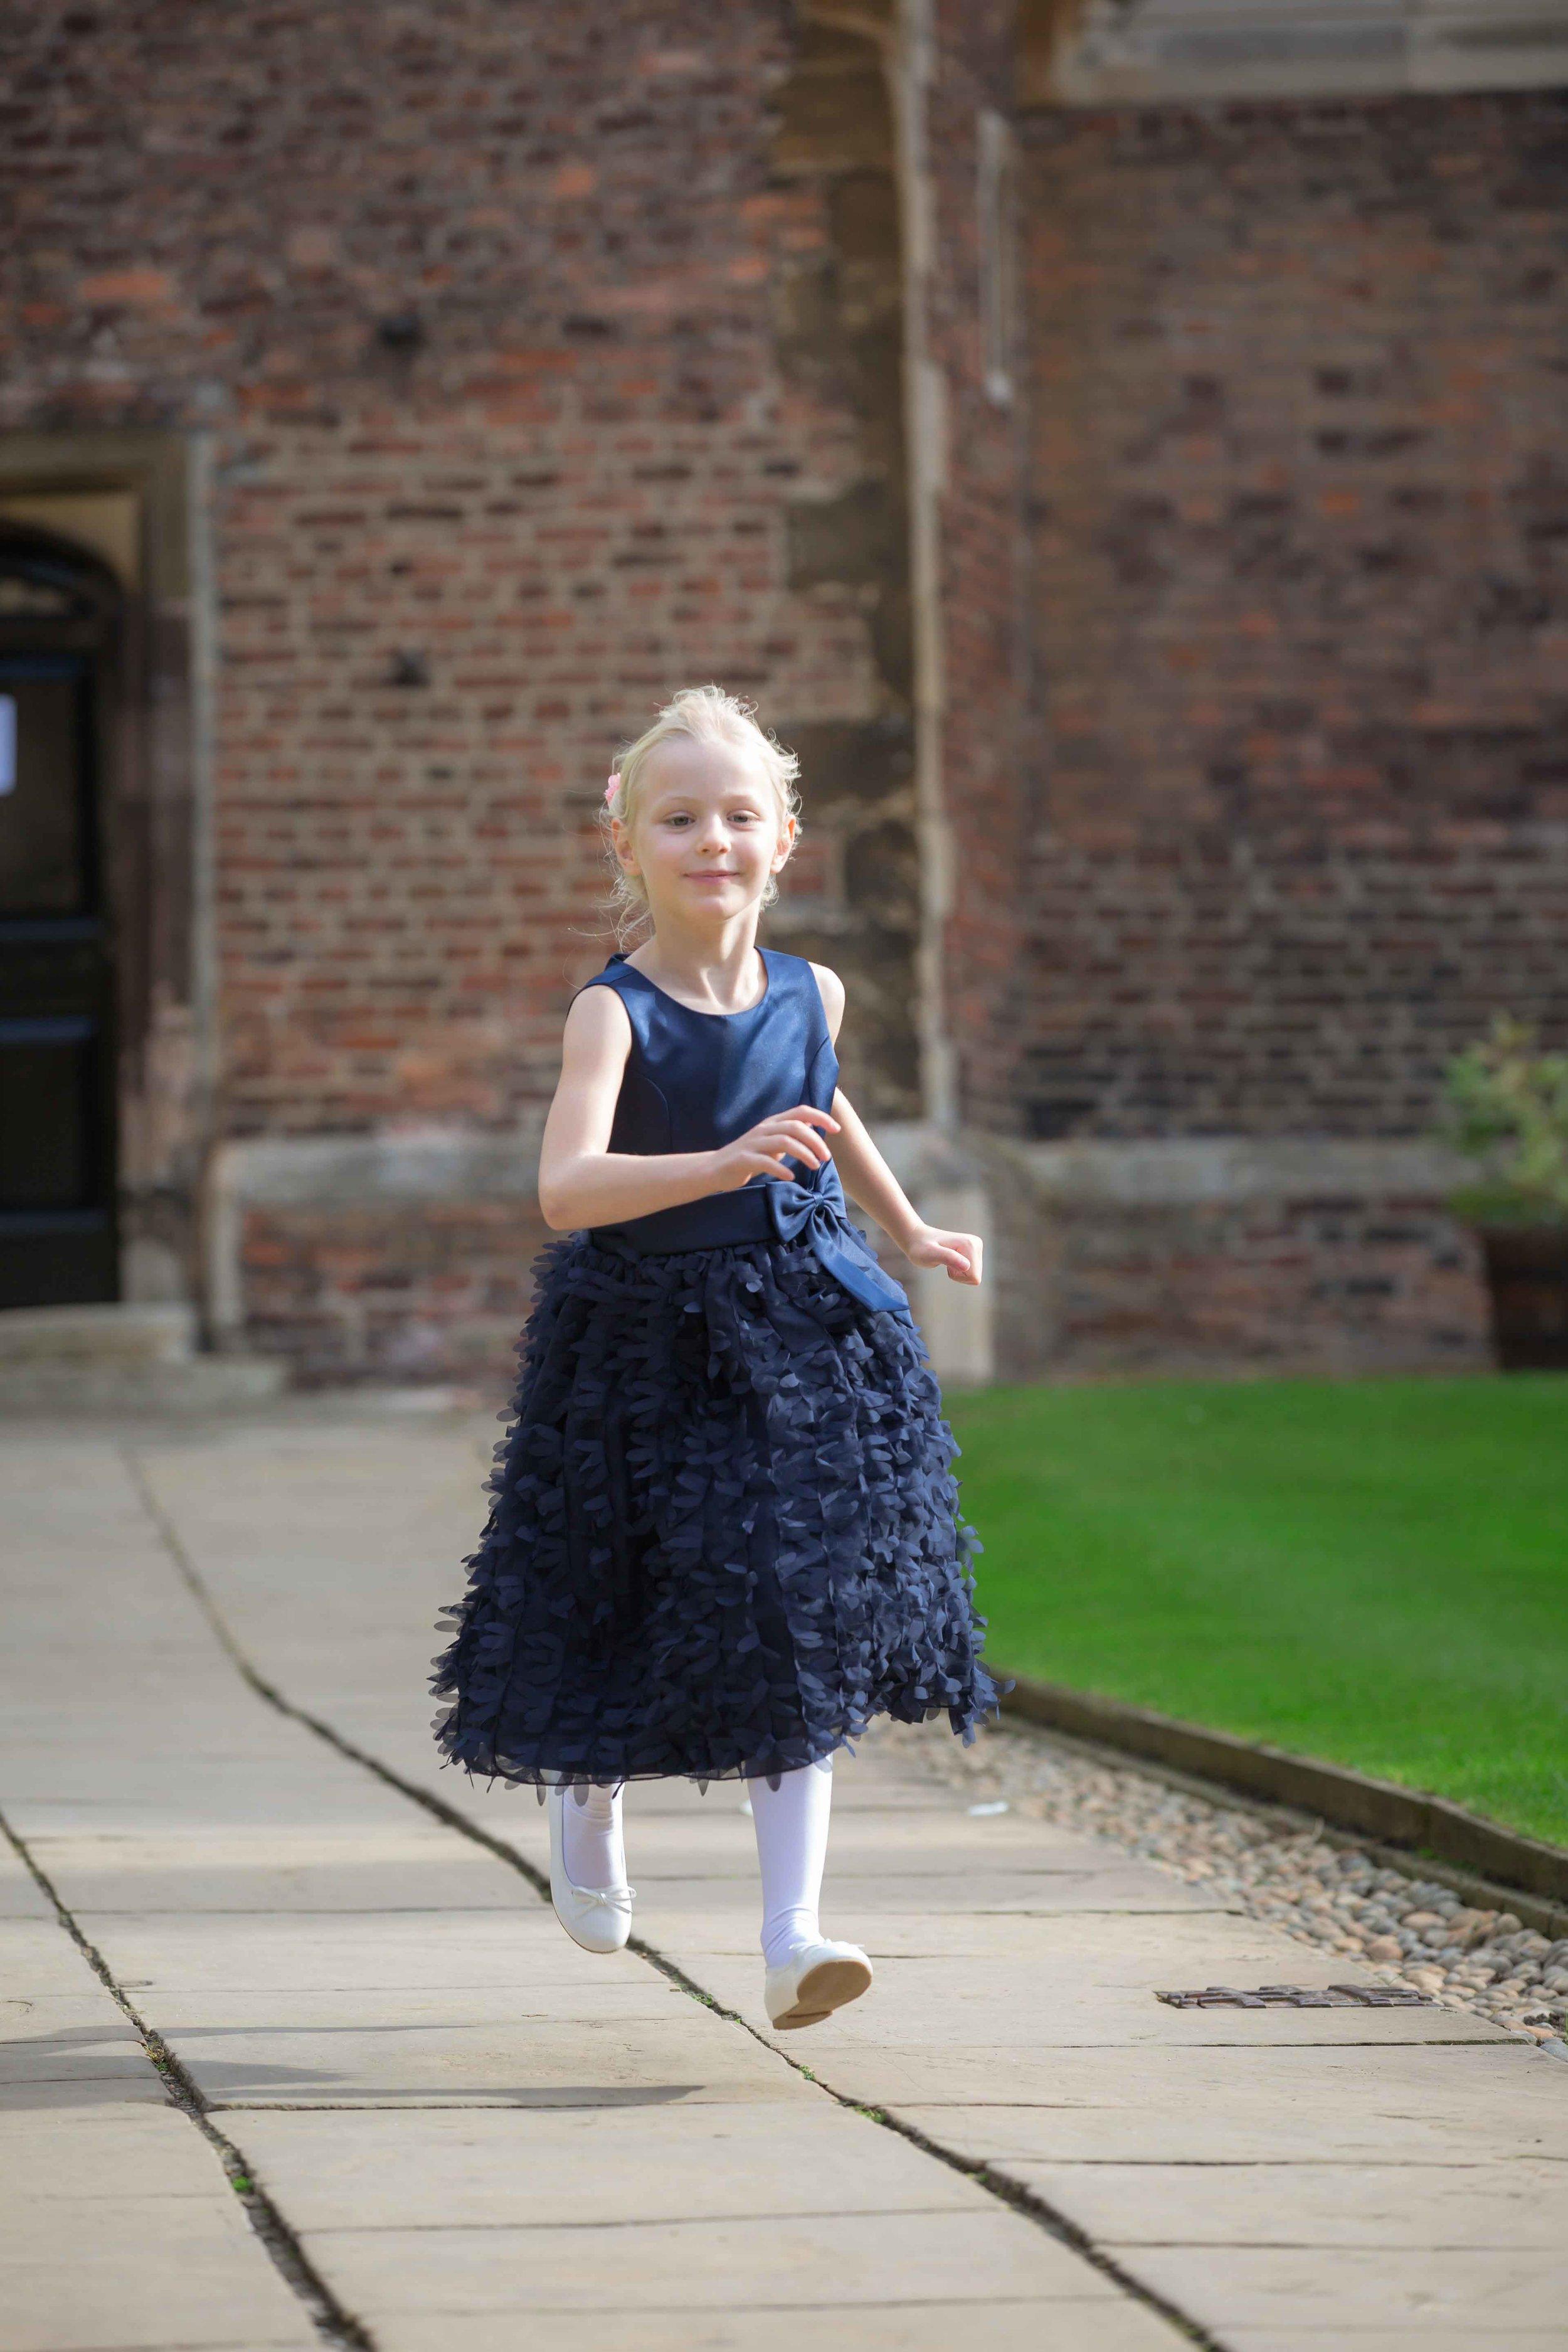 Adrian_Nicole_Charnwood_Weddings_Queens_College_Cambridge-1007.jpg